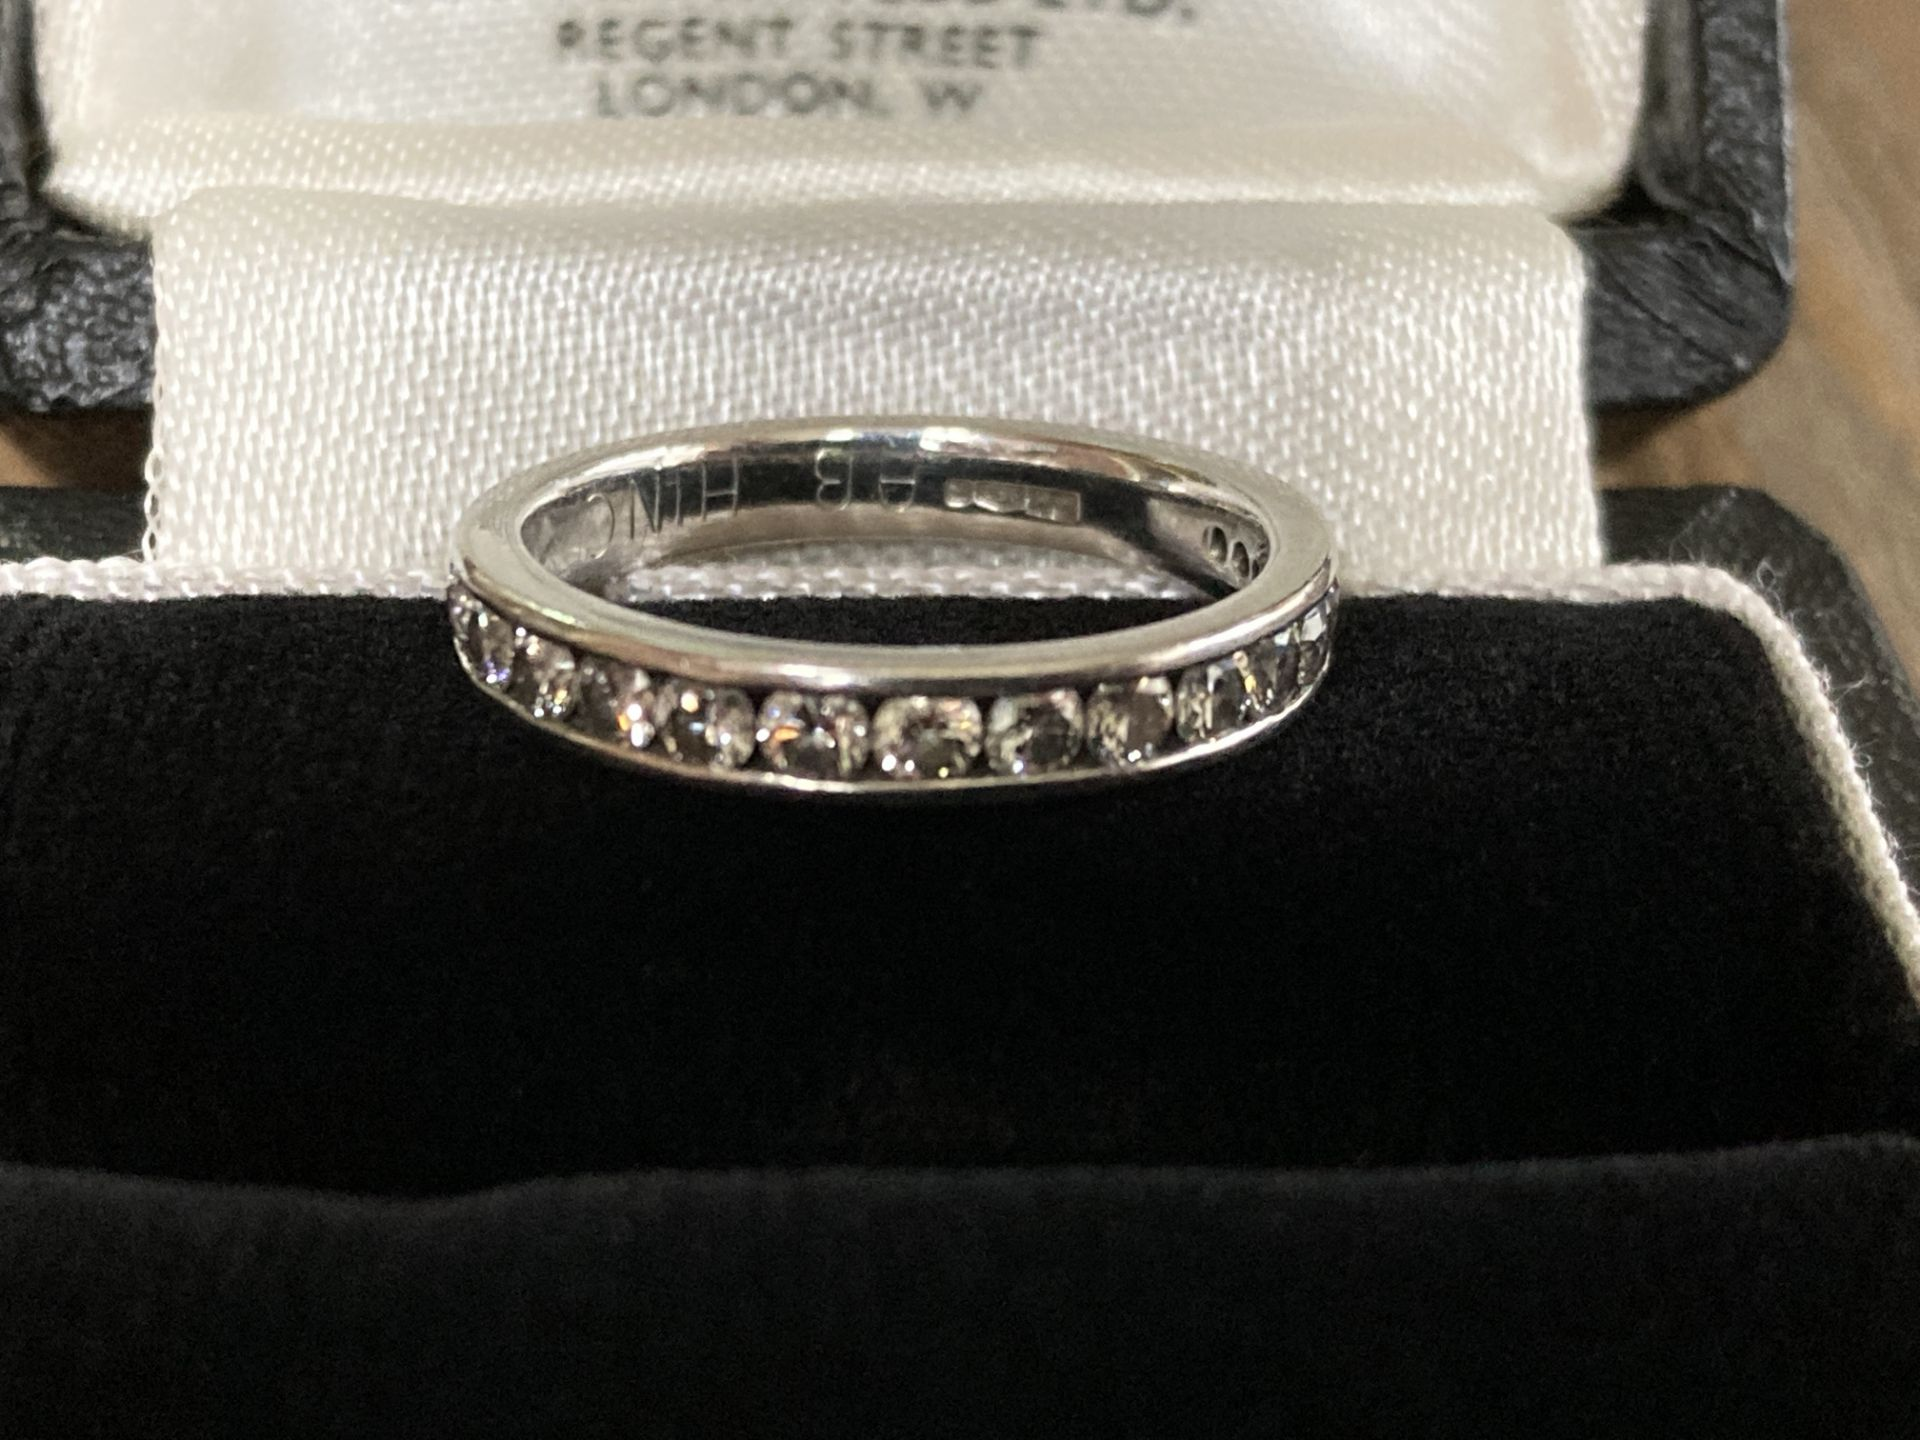 PLATINUM 0.57CT DIAMOND HALF ETERNITY RING (CHANNEL SET) - SIZE: J / WEIGHT: 3.9G